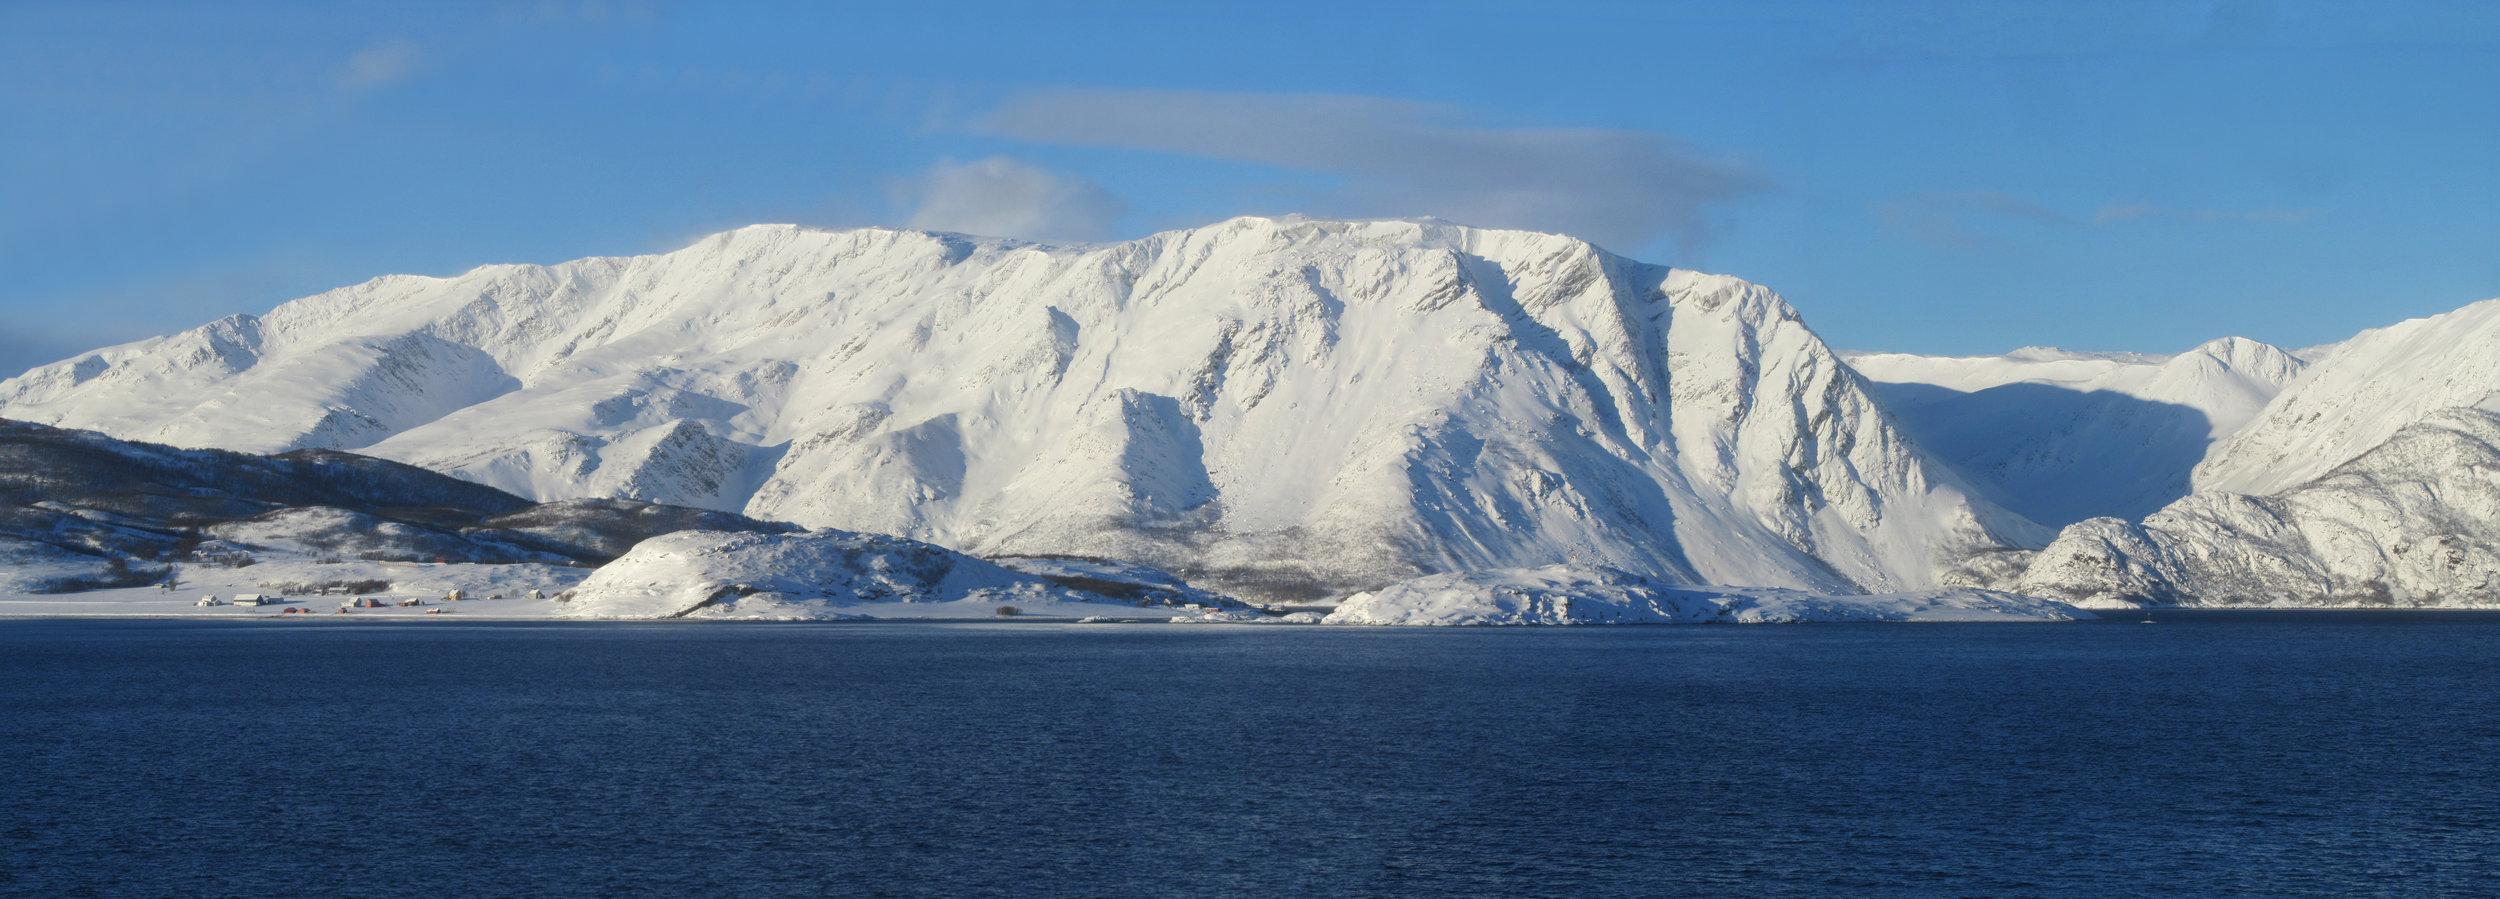 35 The beautiful Arctic scenery.jpg